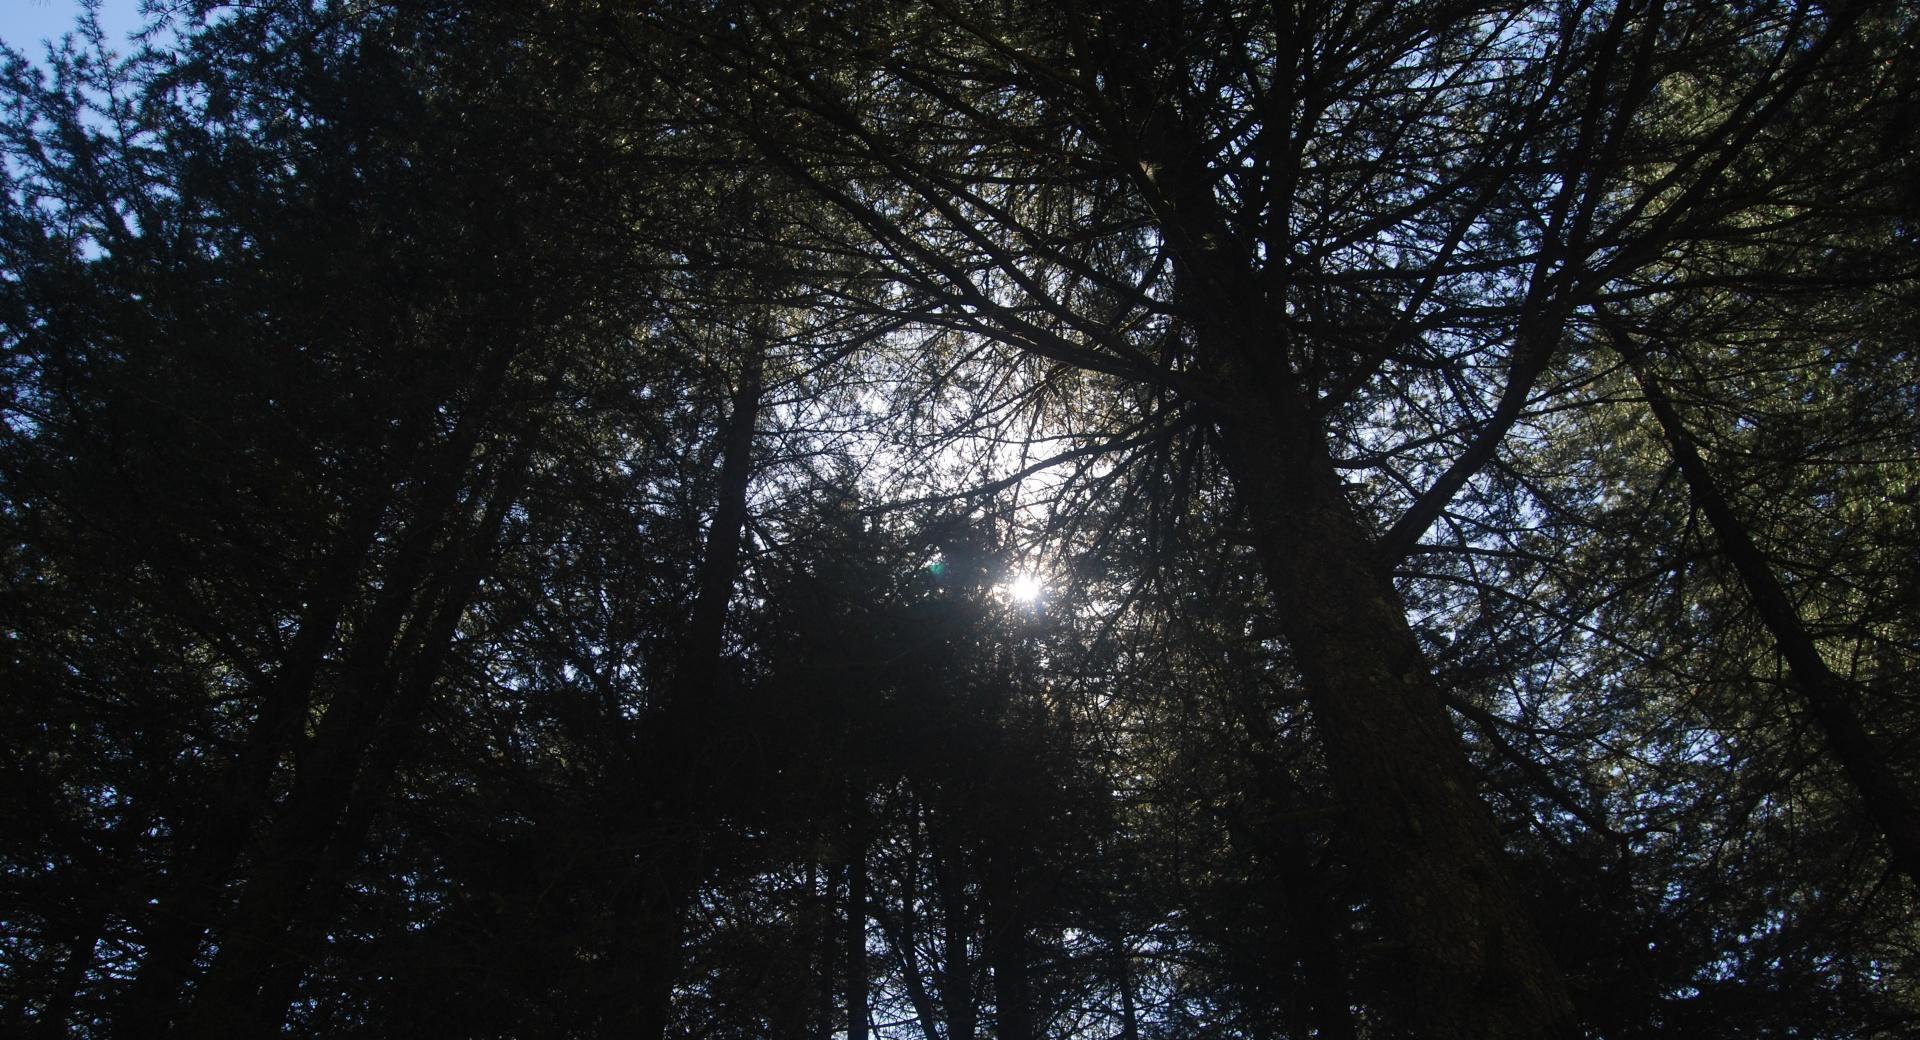 Suns Rays Thru Shades wallpapers HD quality